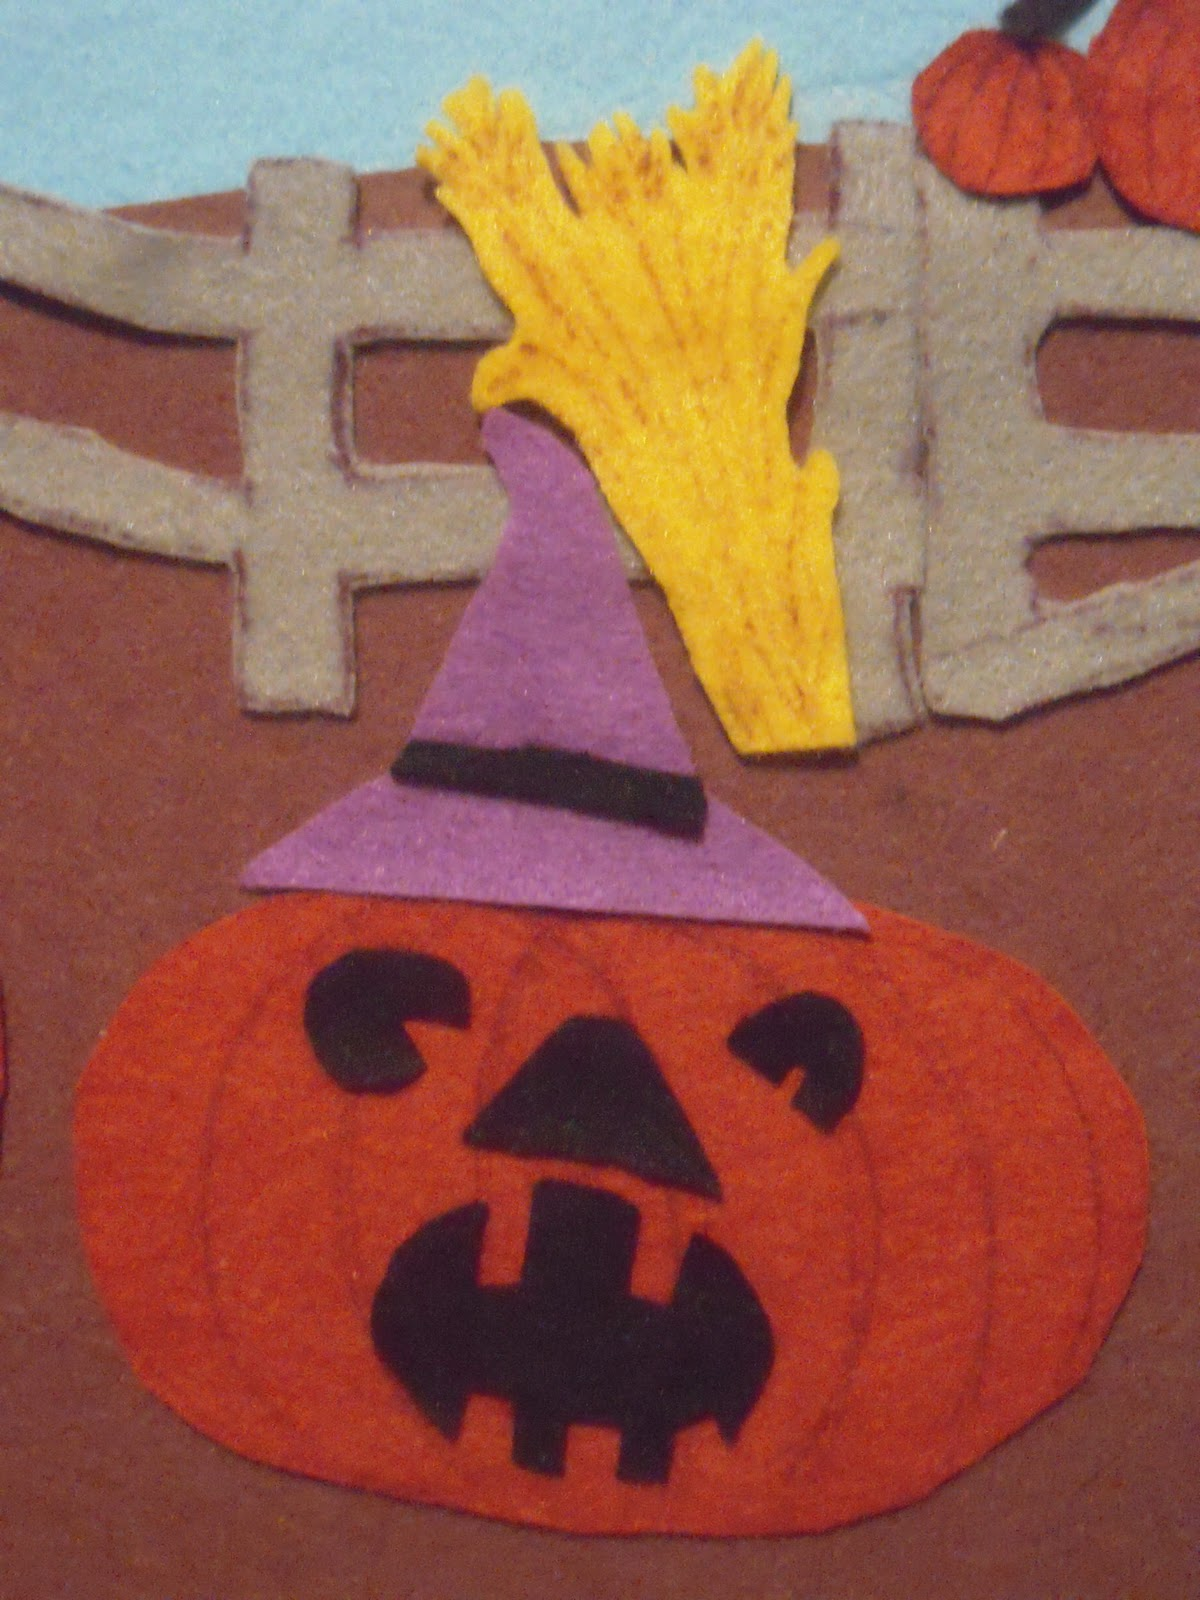 Marvelously Messy : Fall Felt Board Craft